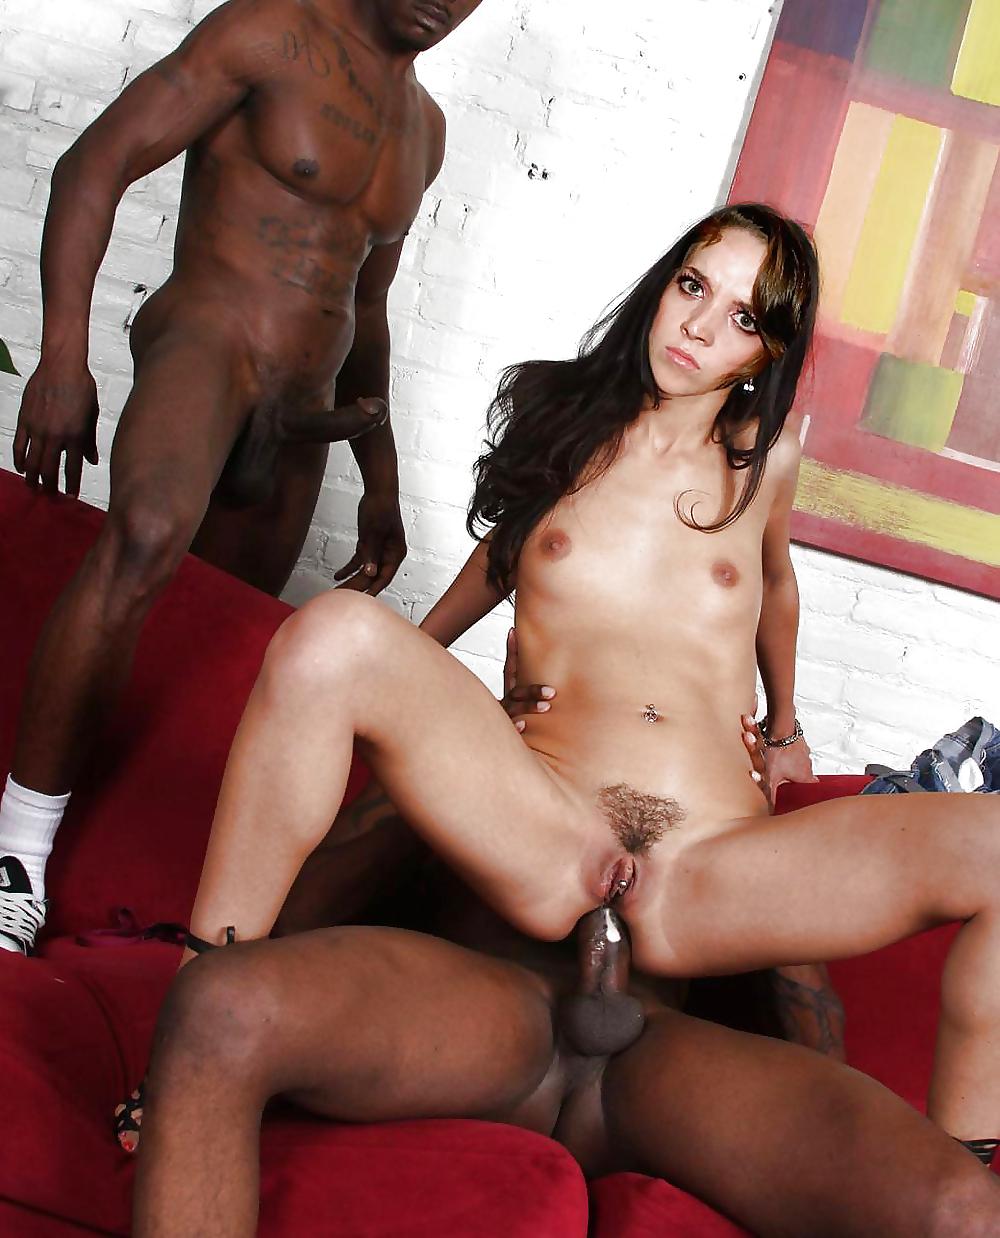 Jaime ray newman nude celeb